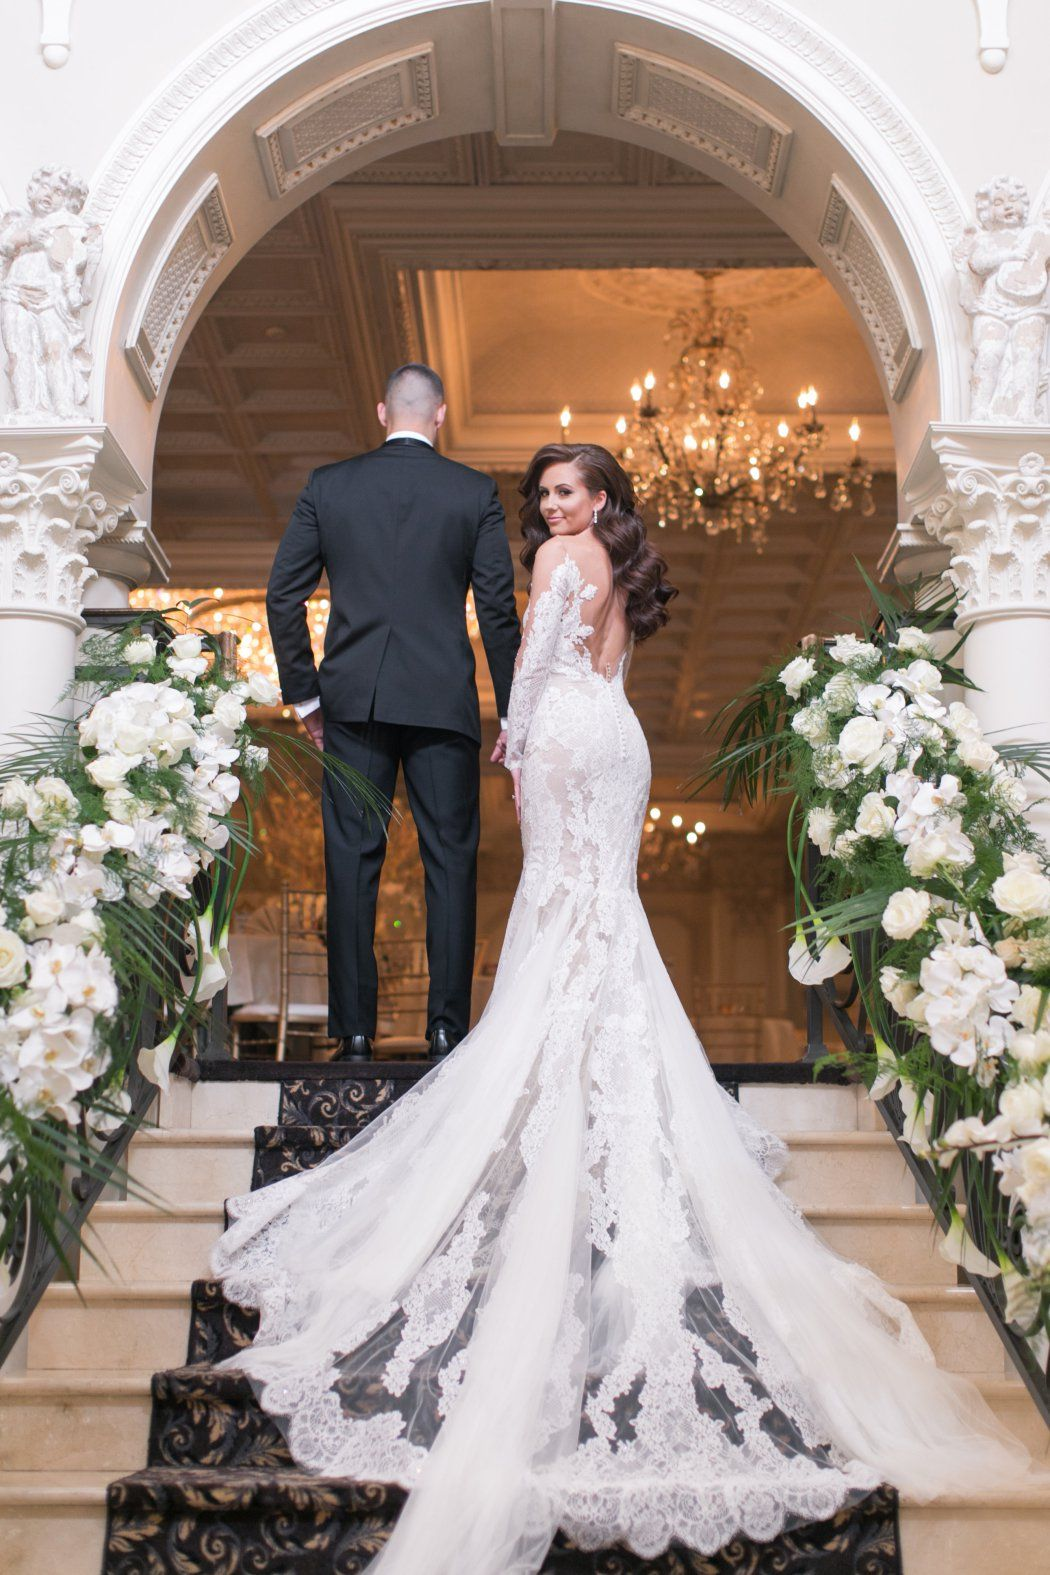 View More Http Amyrizzuto Pass Us Toriandfrank Wedding Dresses Wedding Dresses Lace Dream Wedding Dresses